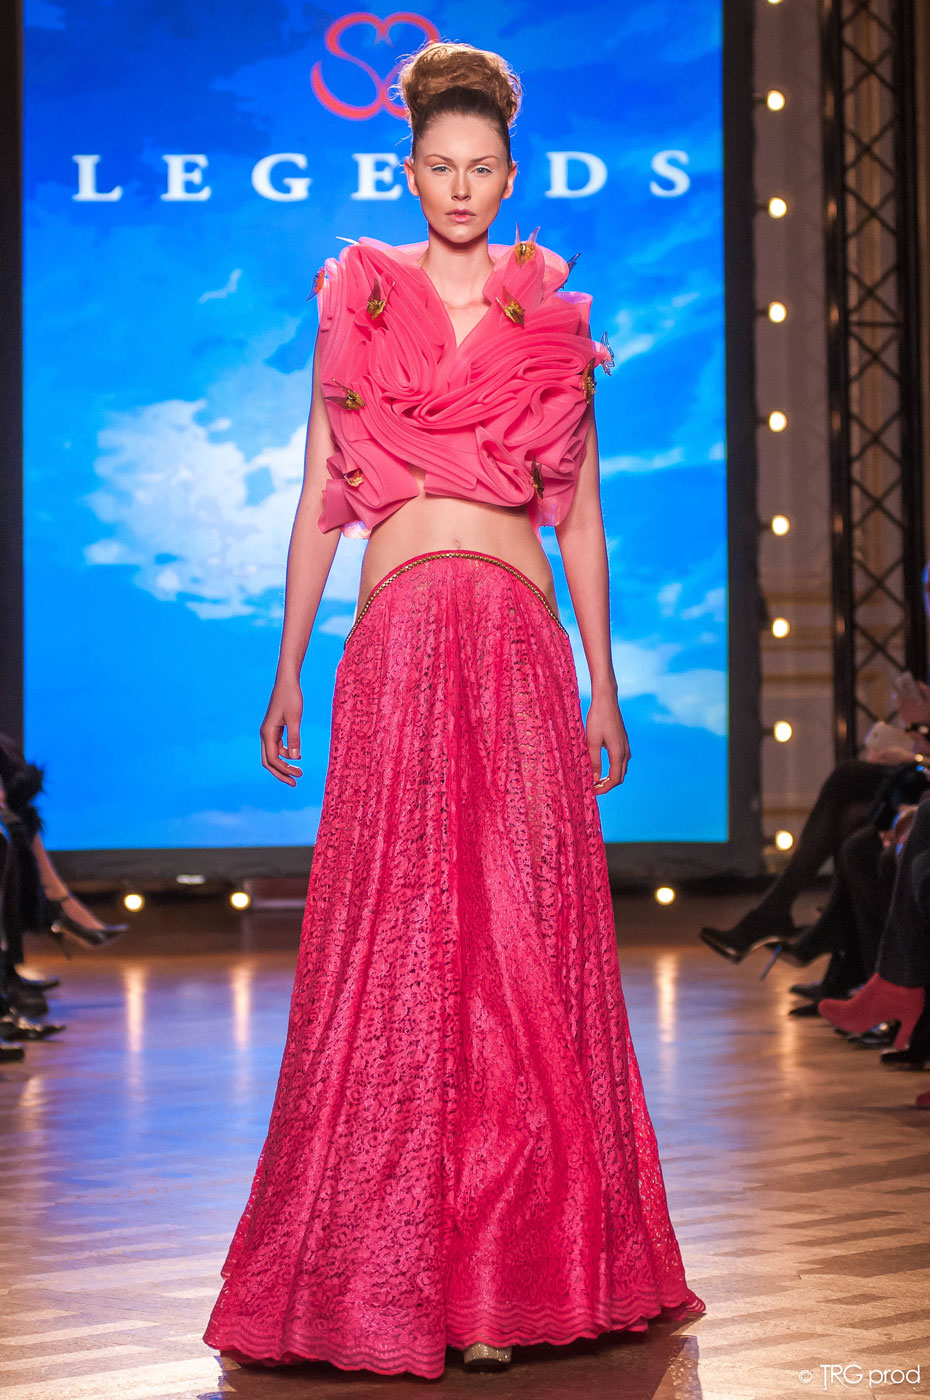 Legends-fashion-runway-show-haute-couture-paris-spring-2015-the-impression-19